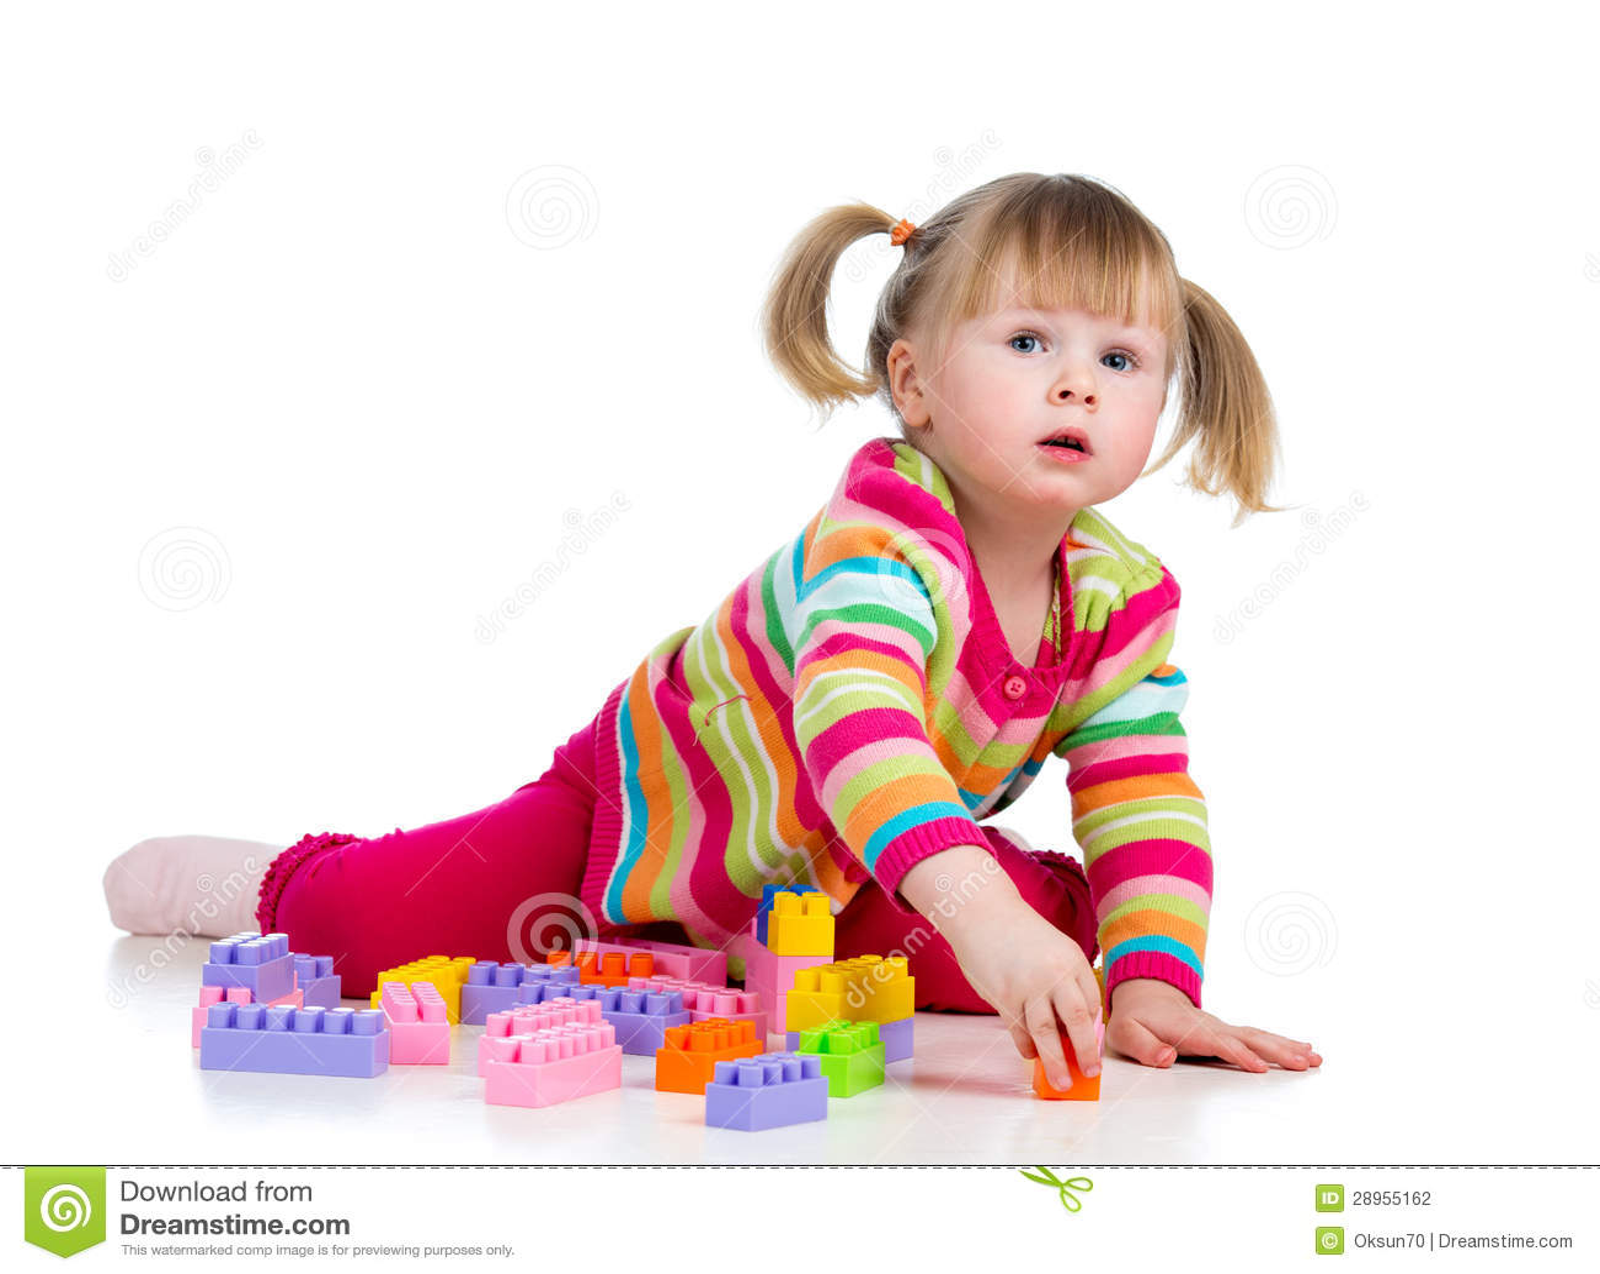 Девочки с игрушками фото 71-164